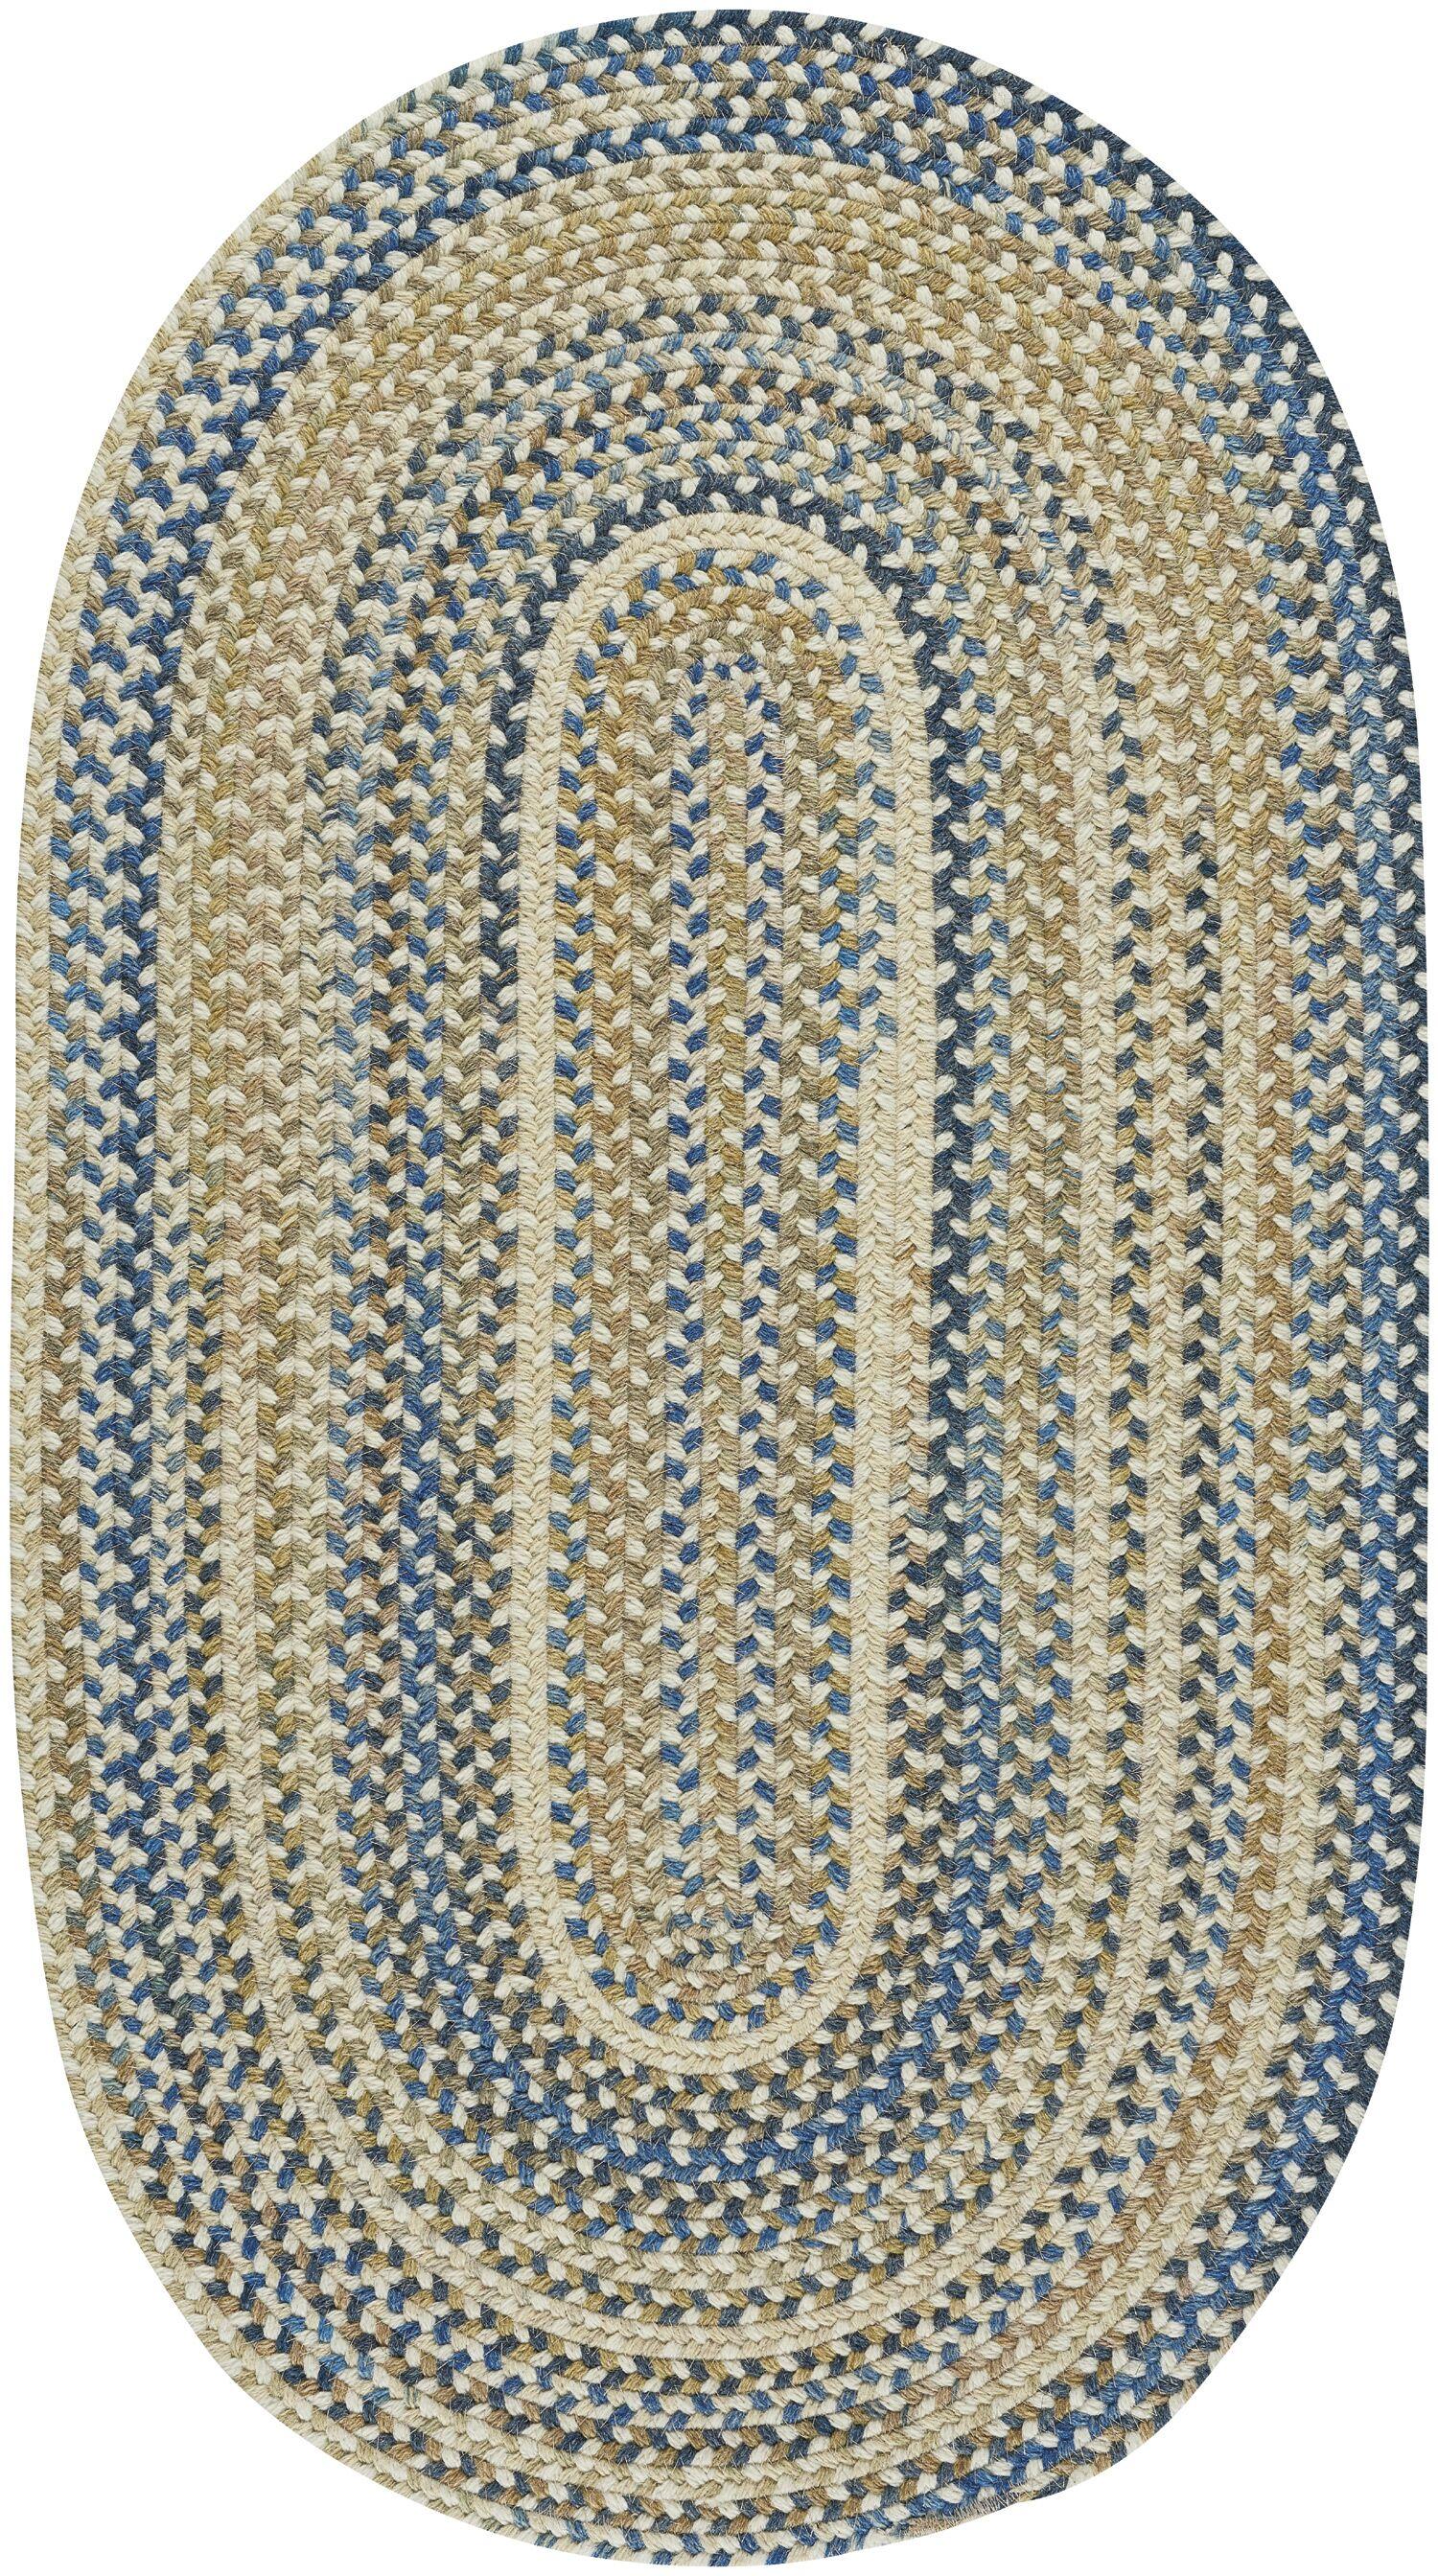 Myrtille Light Tan Area Rug Rug Size: Oval 7' x 9'